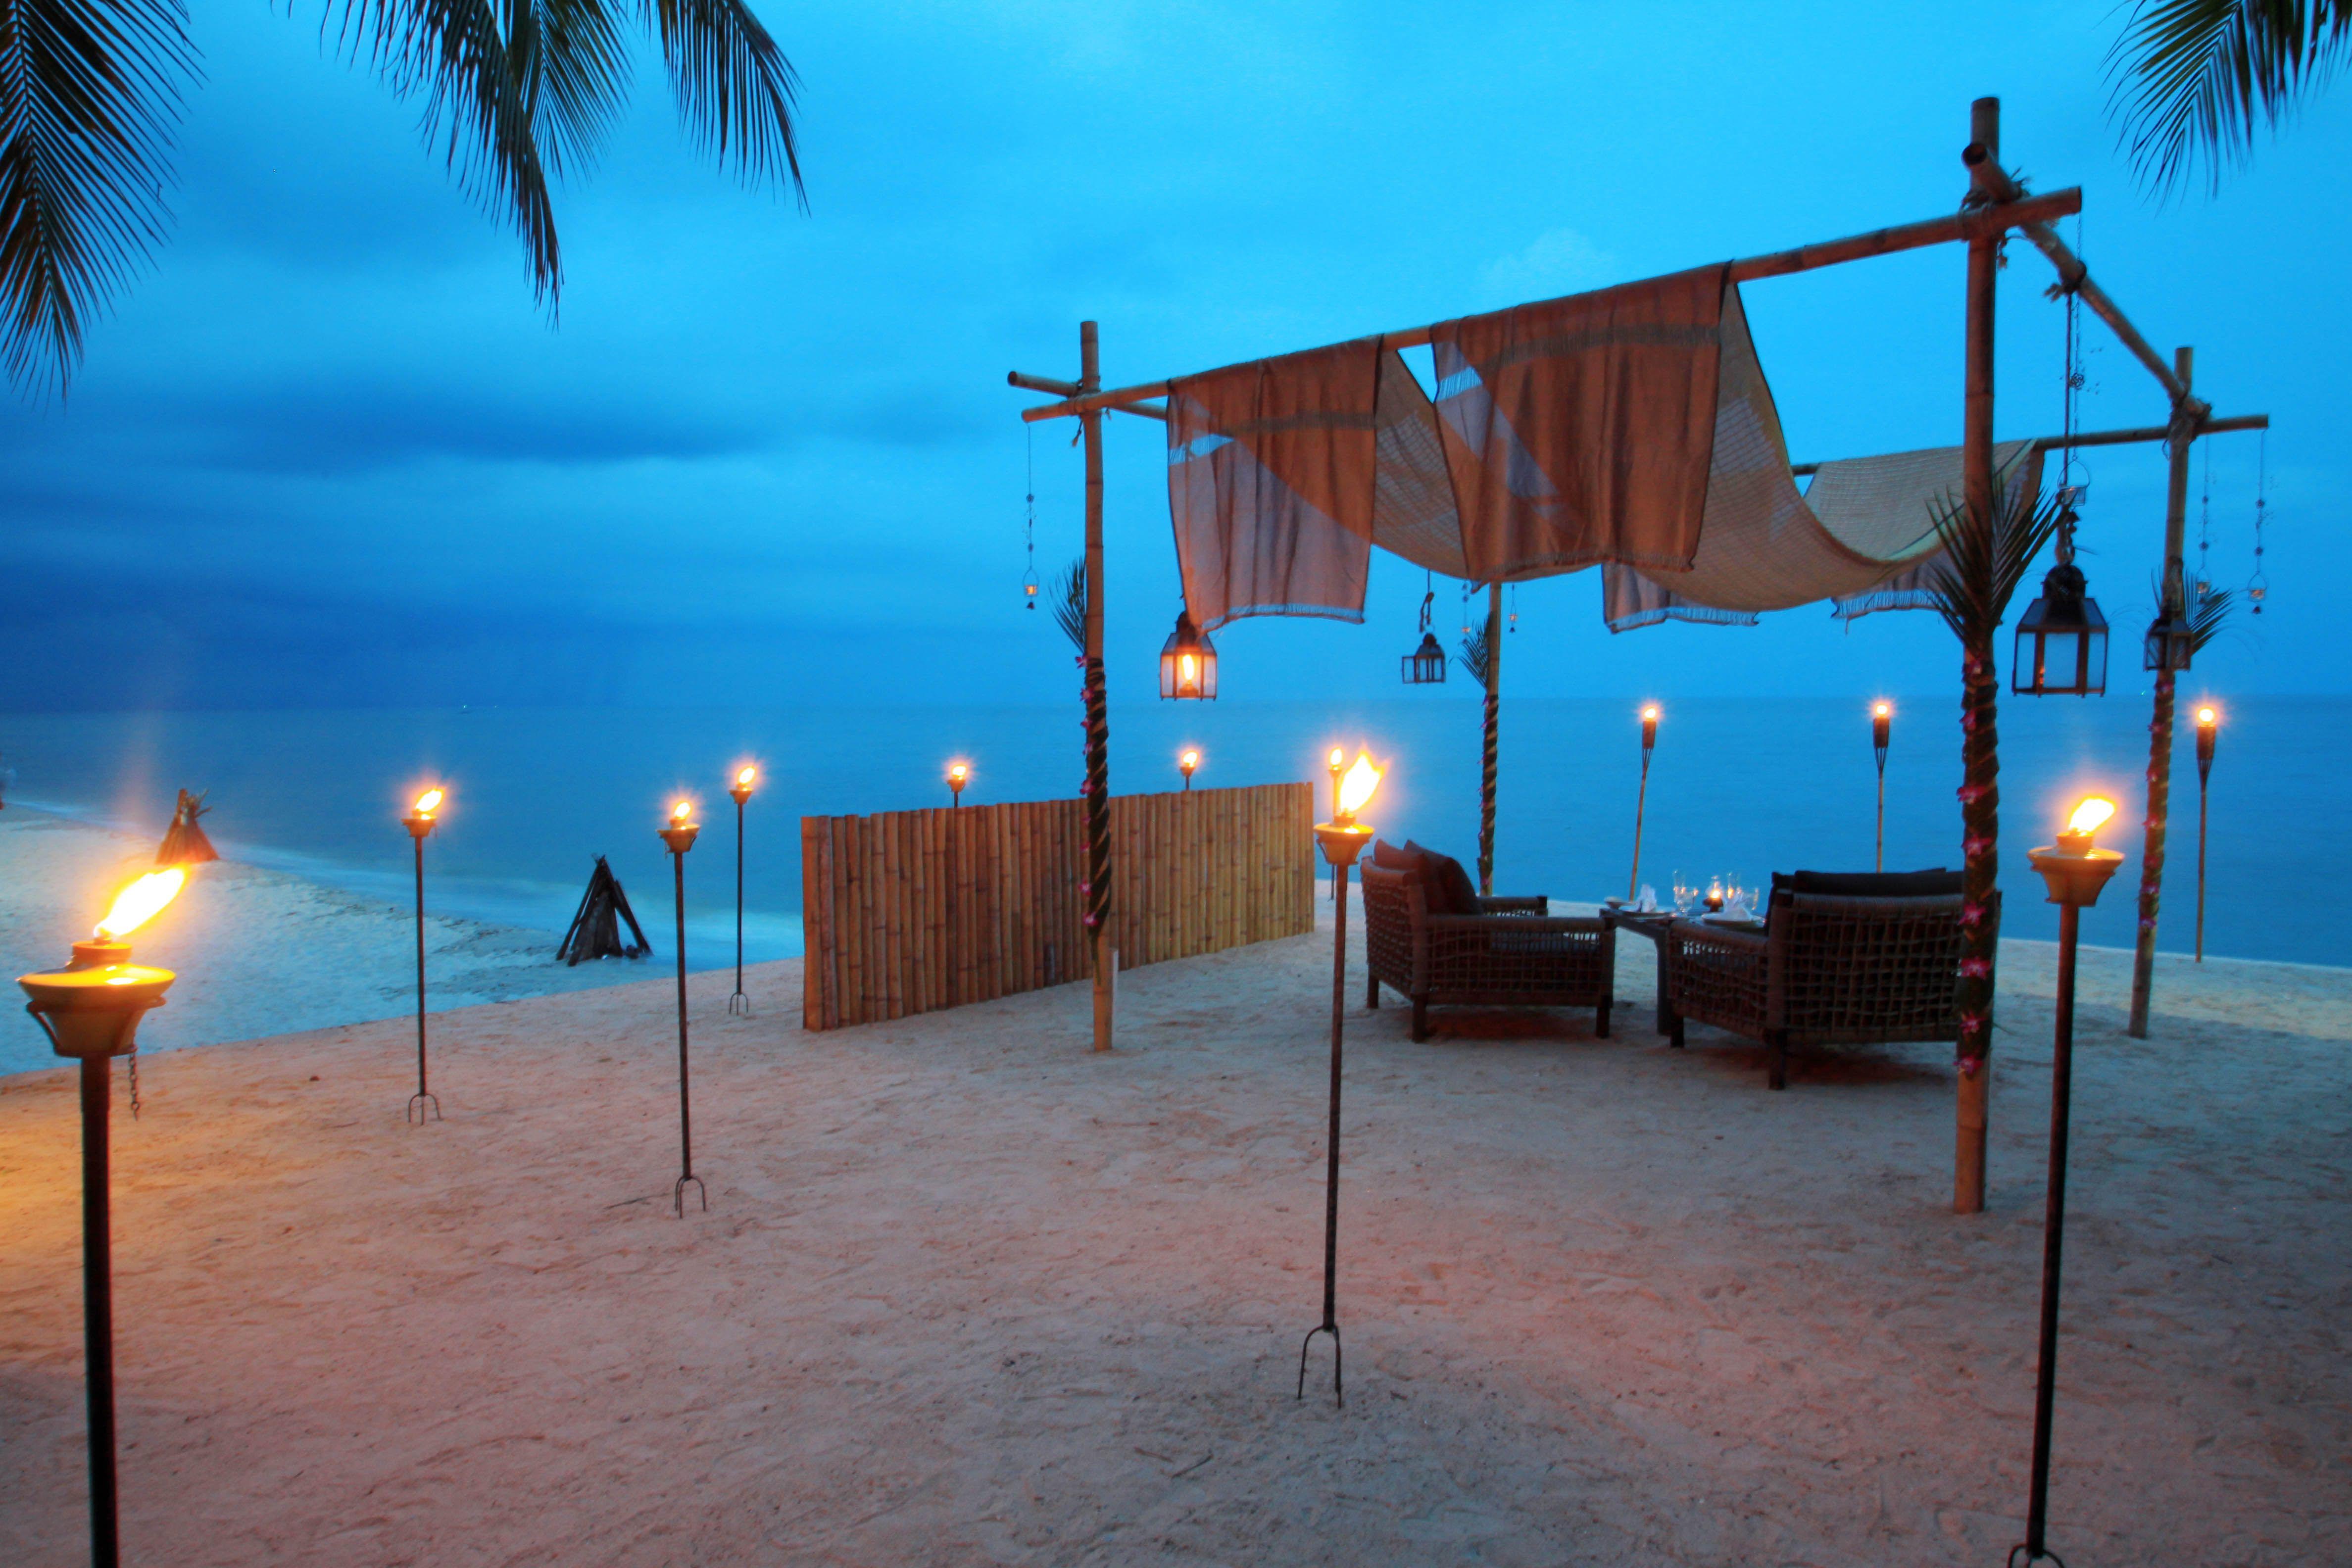 Romantic Candle Lit Beach Dinner Set Up At Anantara Hua